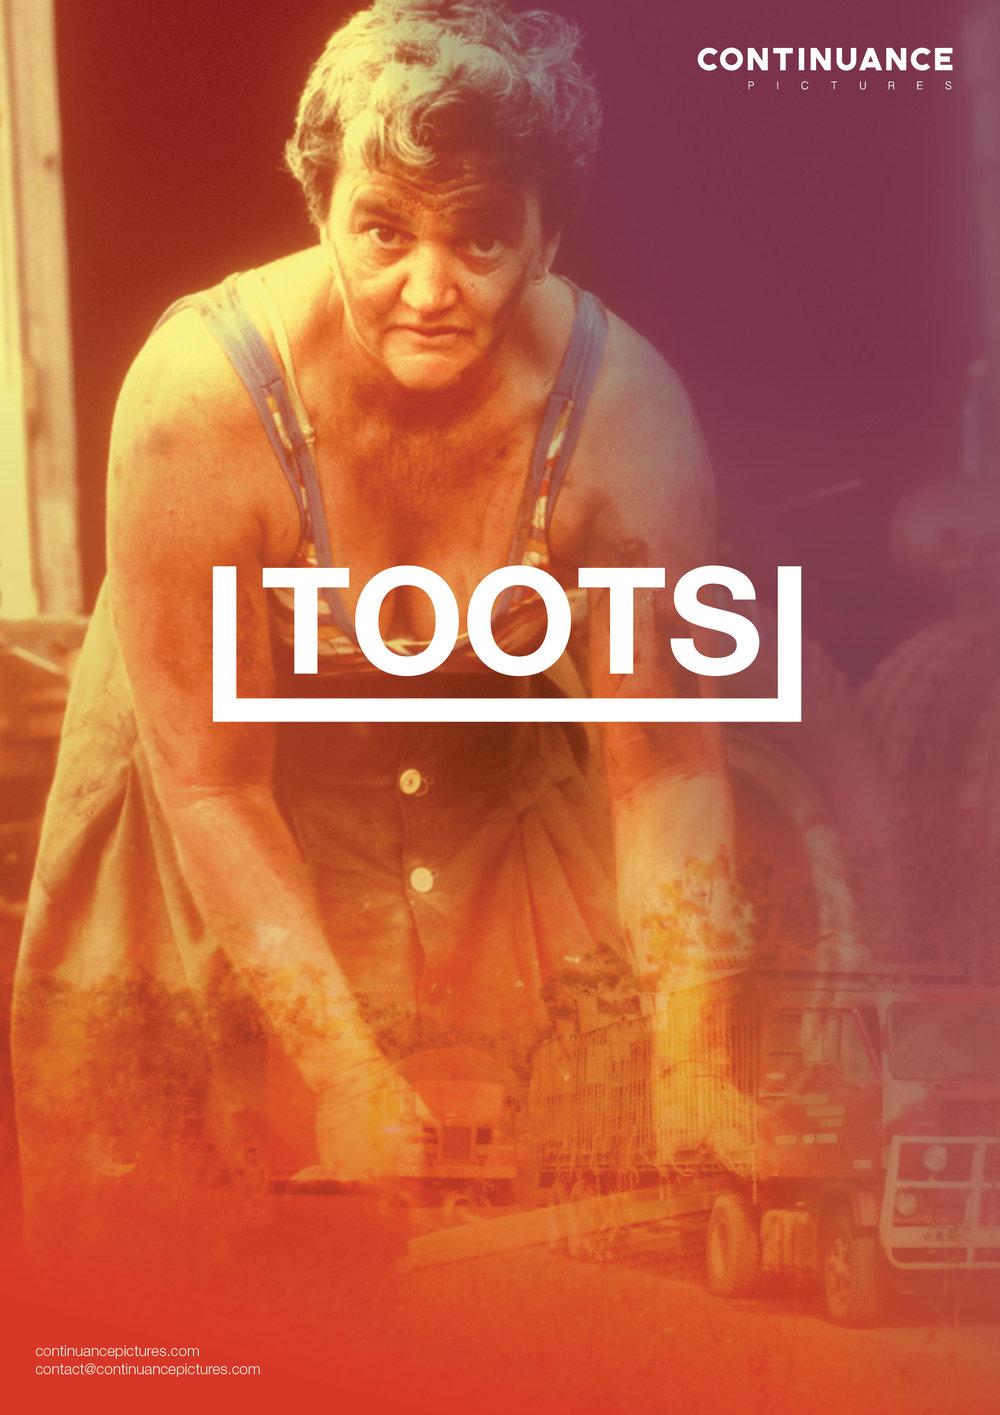 Toots.jpg